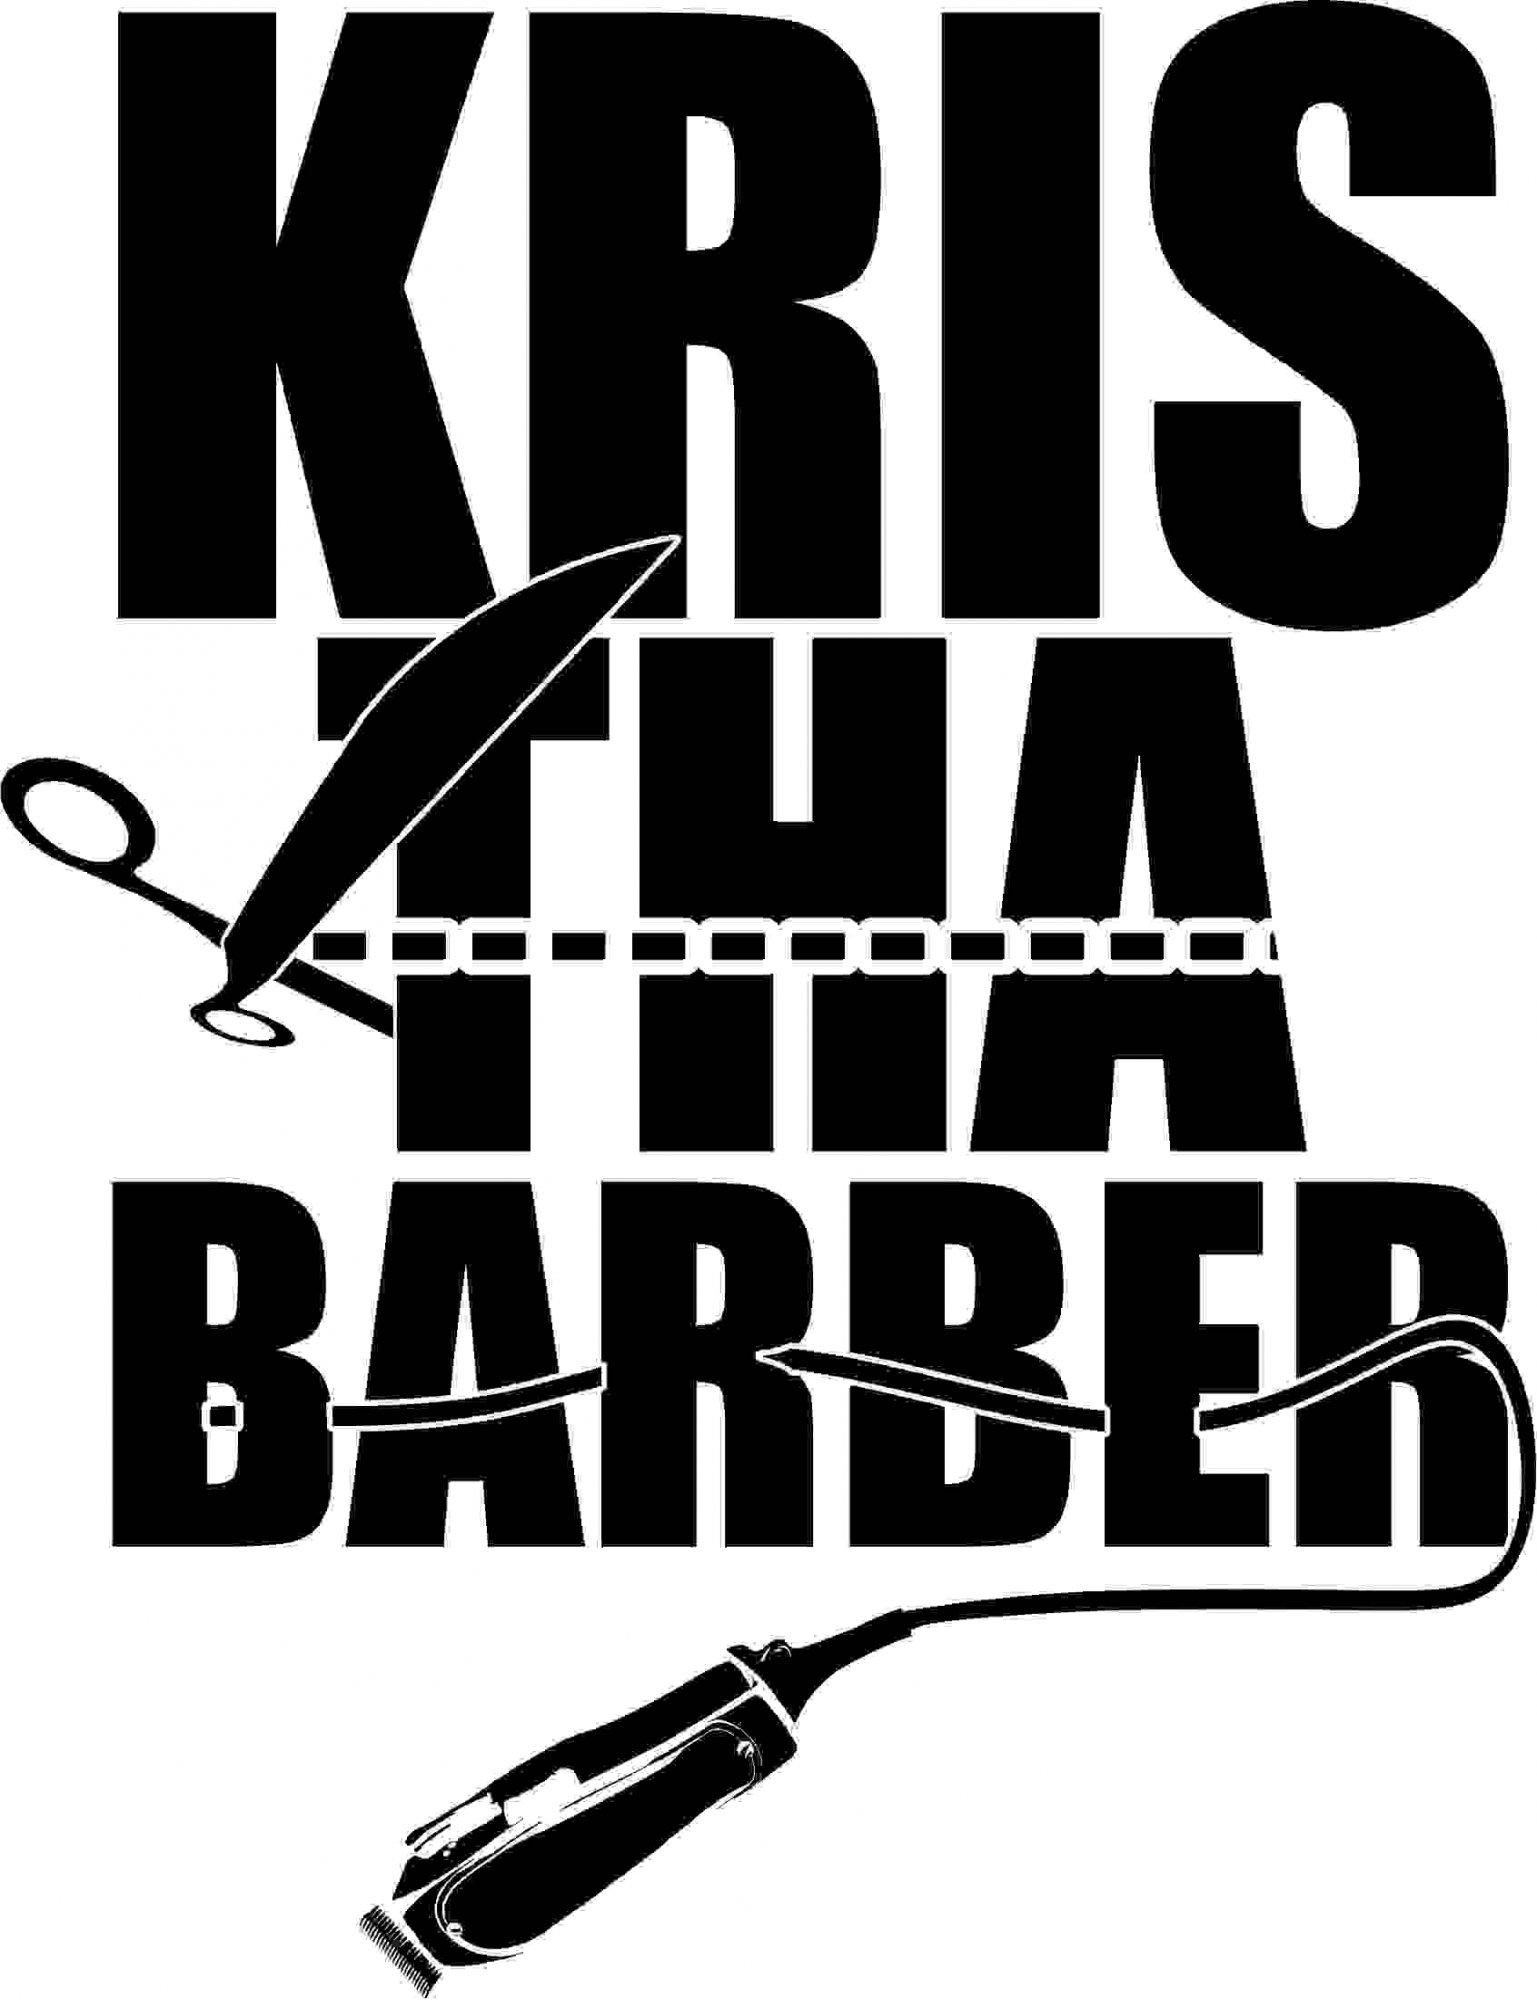 barber logo download - HD1537×2000